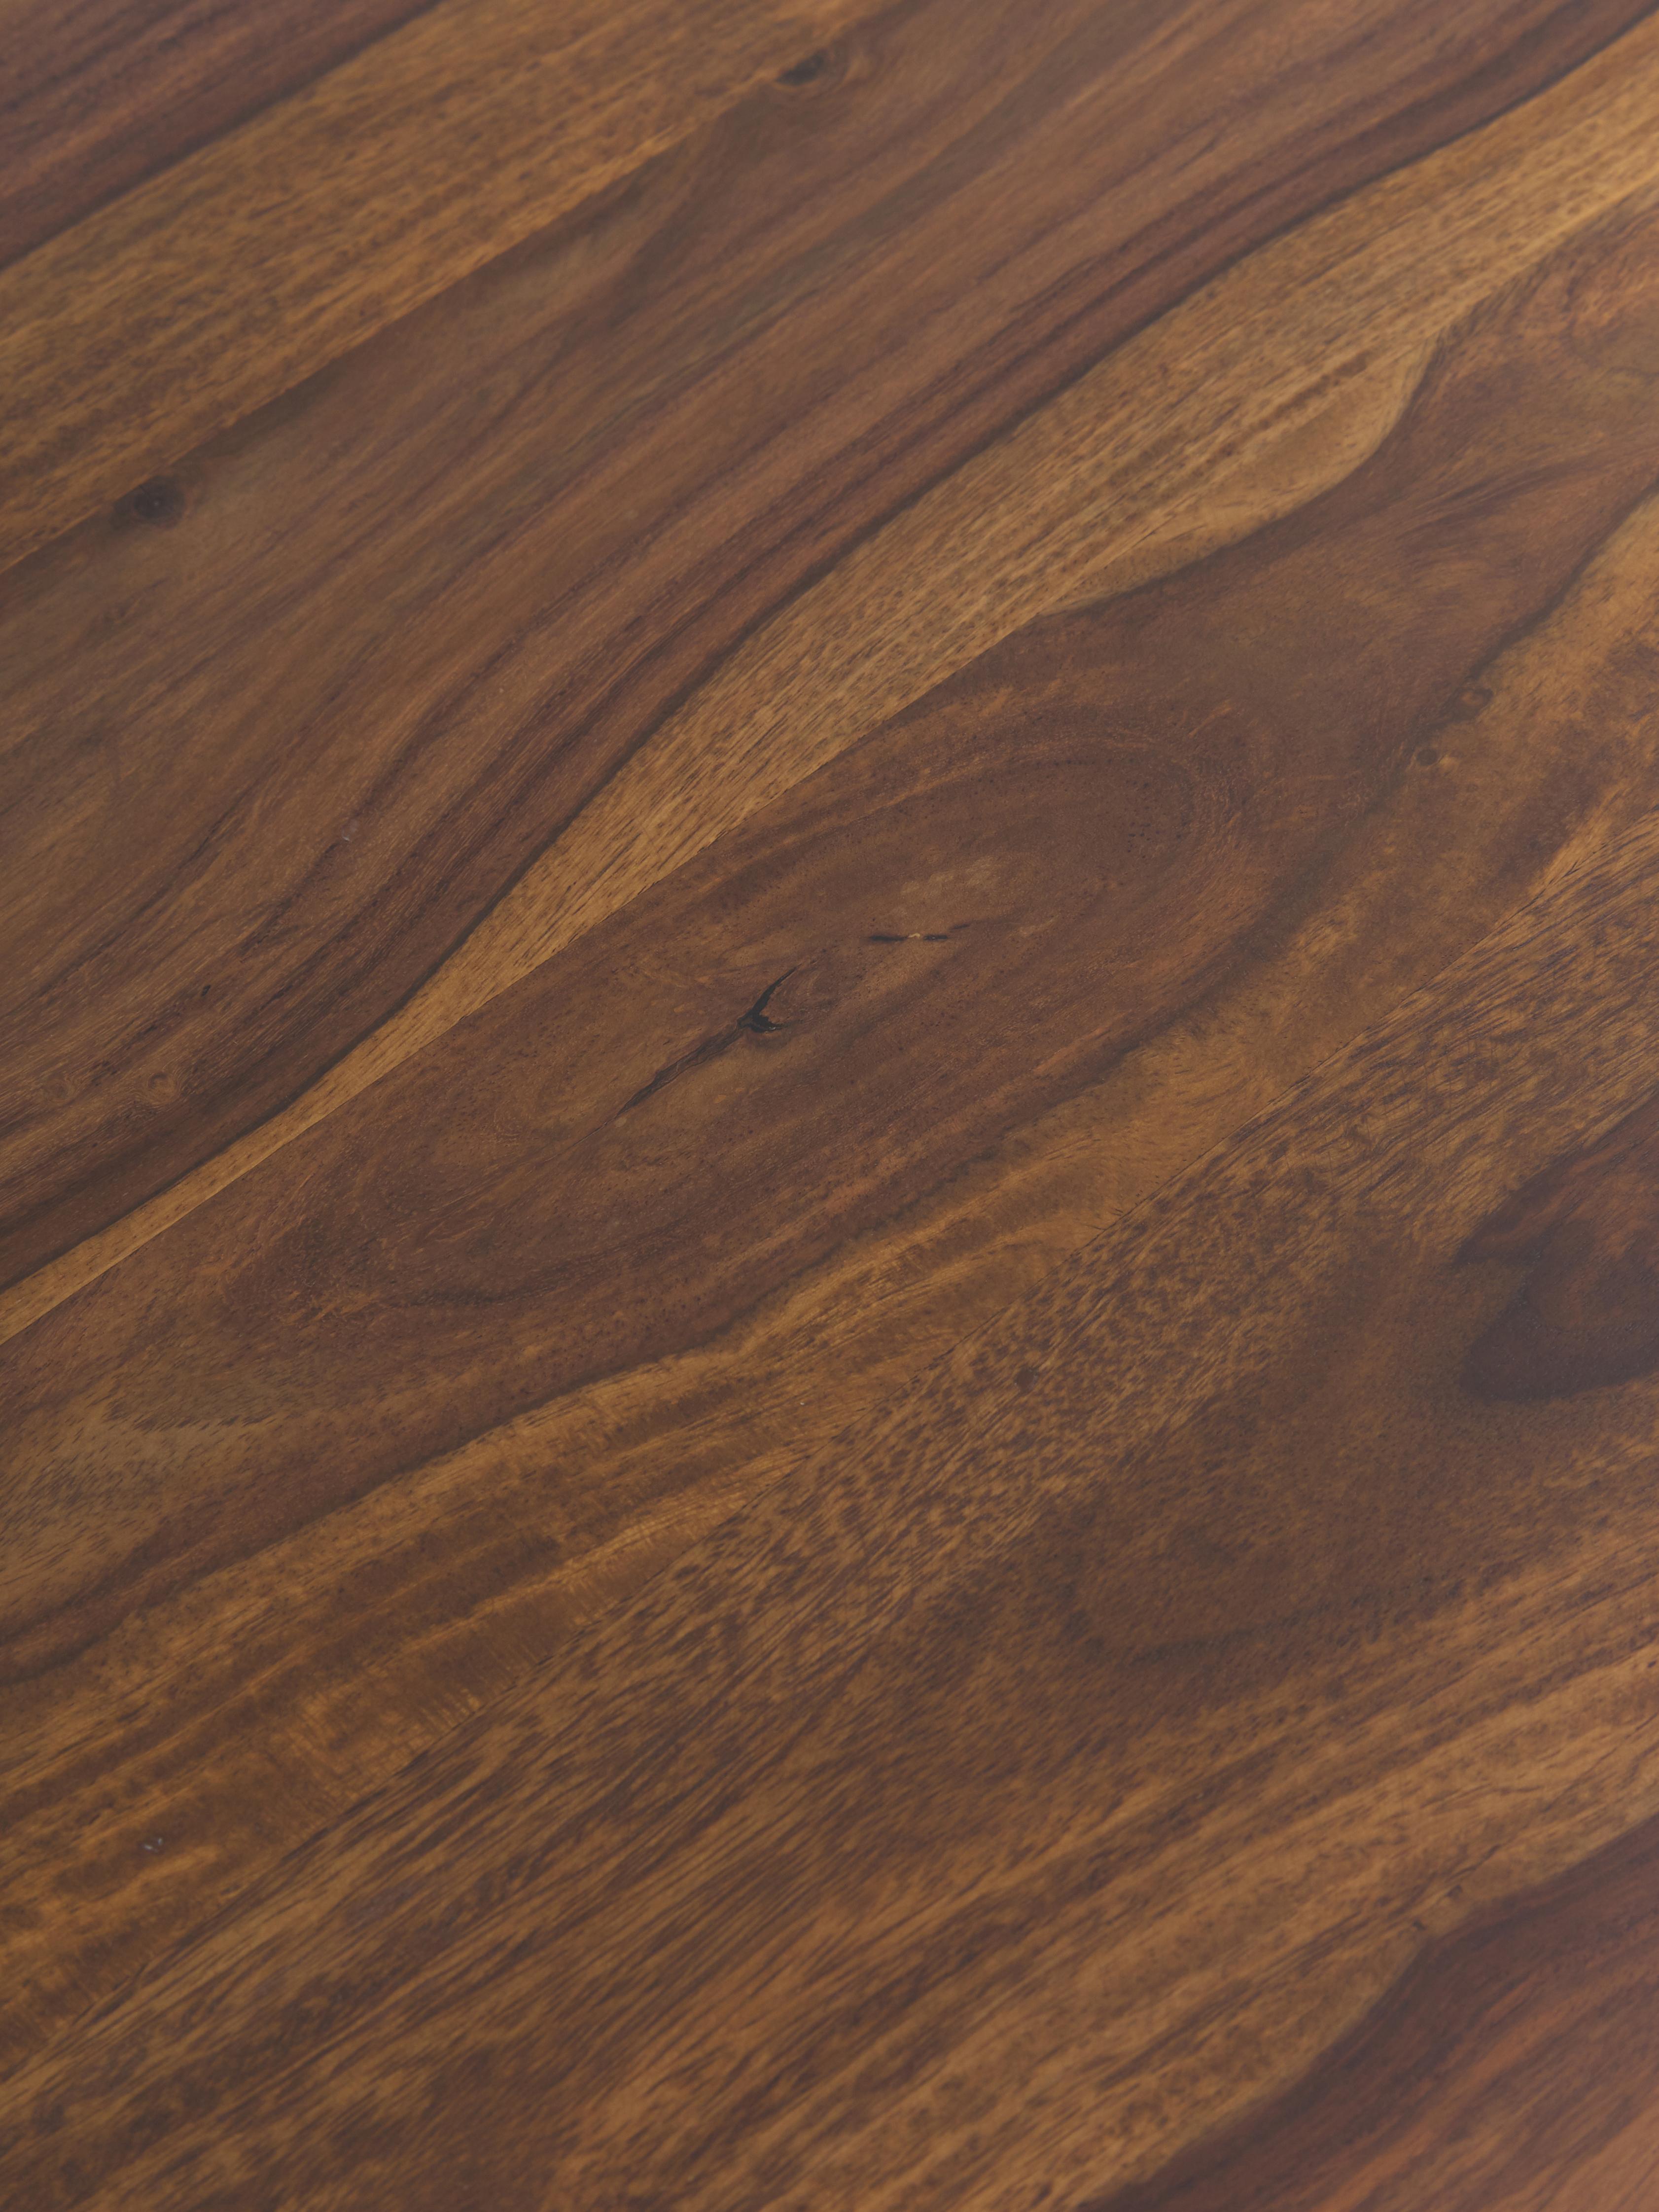 Schreibtisch Repa aus Massivholz, Sheeshamholz, massiv, lackiert, Sheeshamholz, Schwarz, 117 x 75 cm